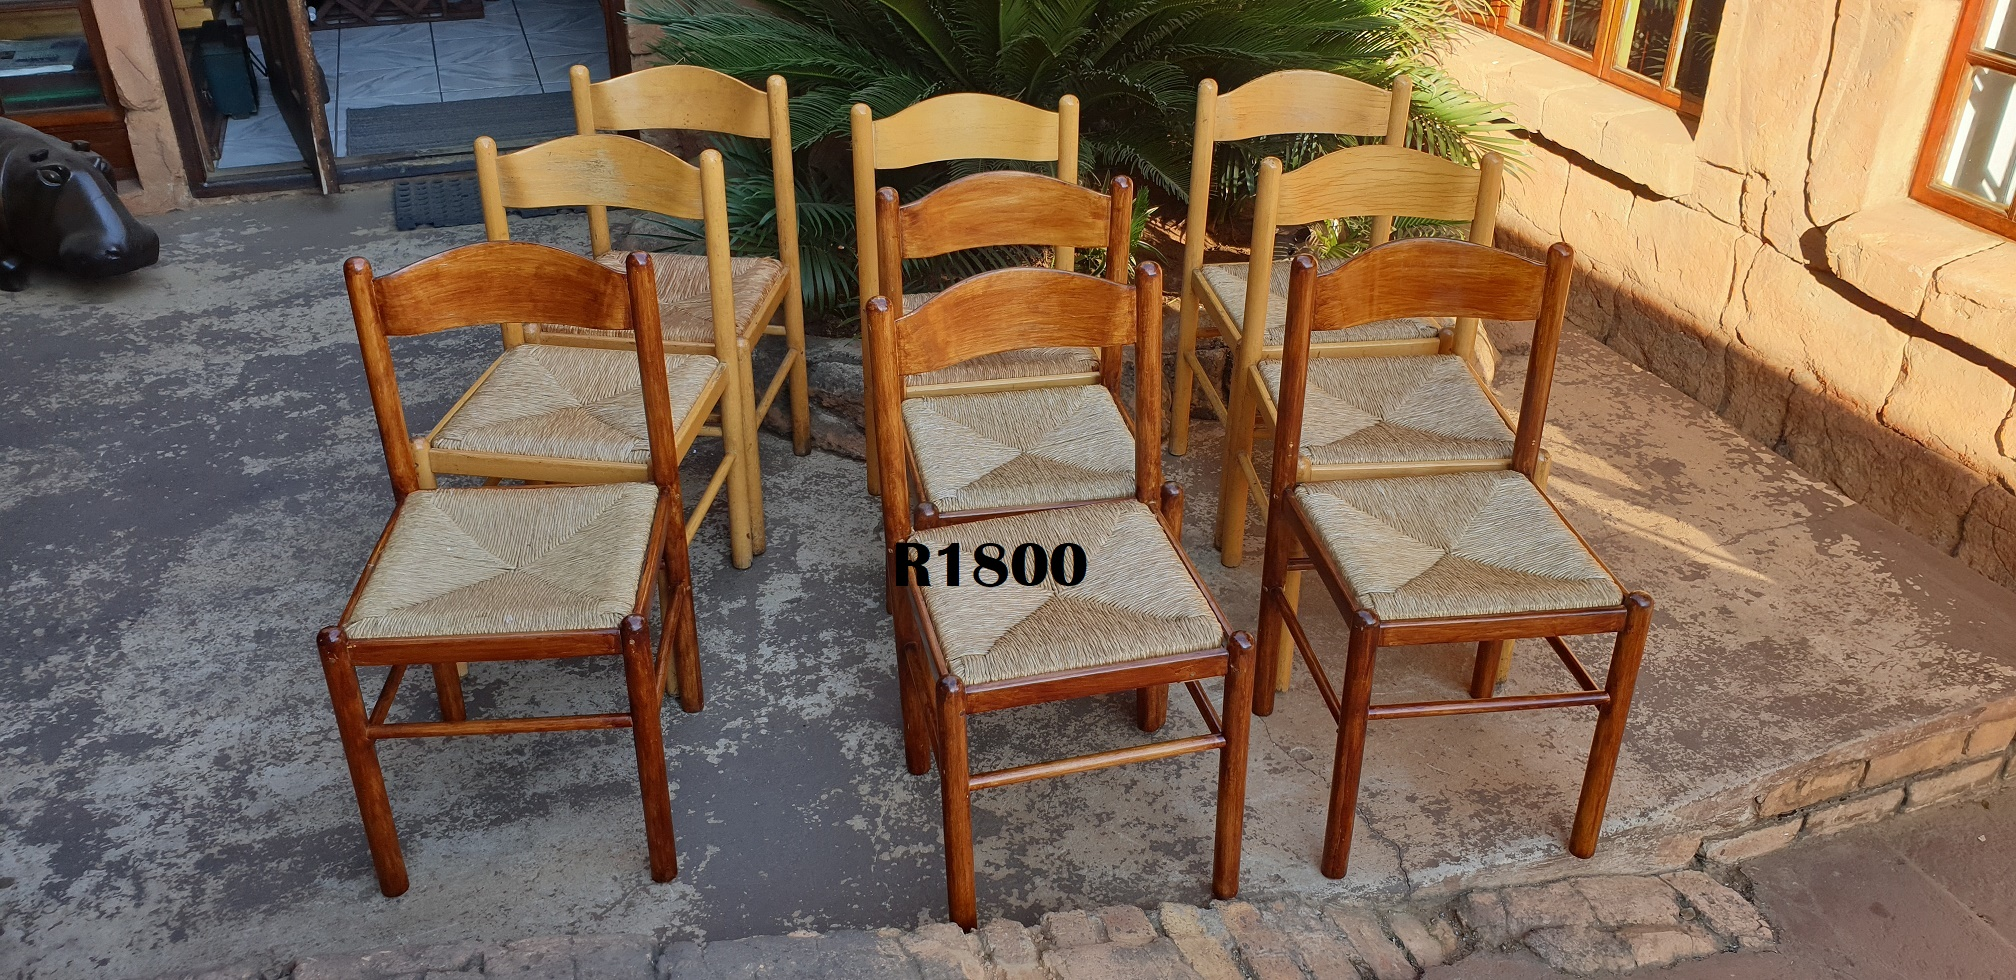 9 X Wicker Globe Chairs